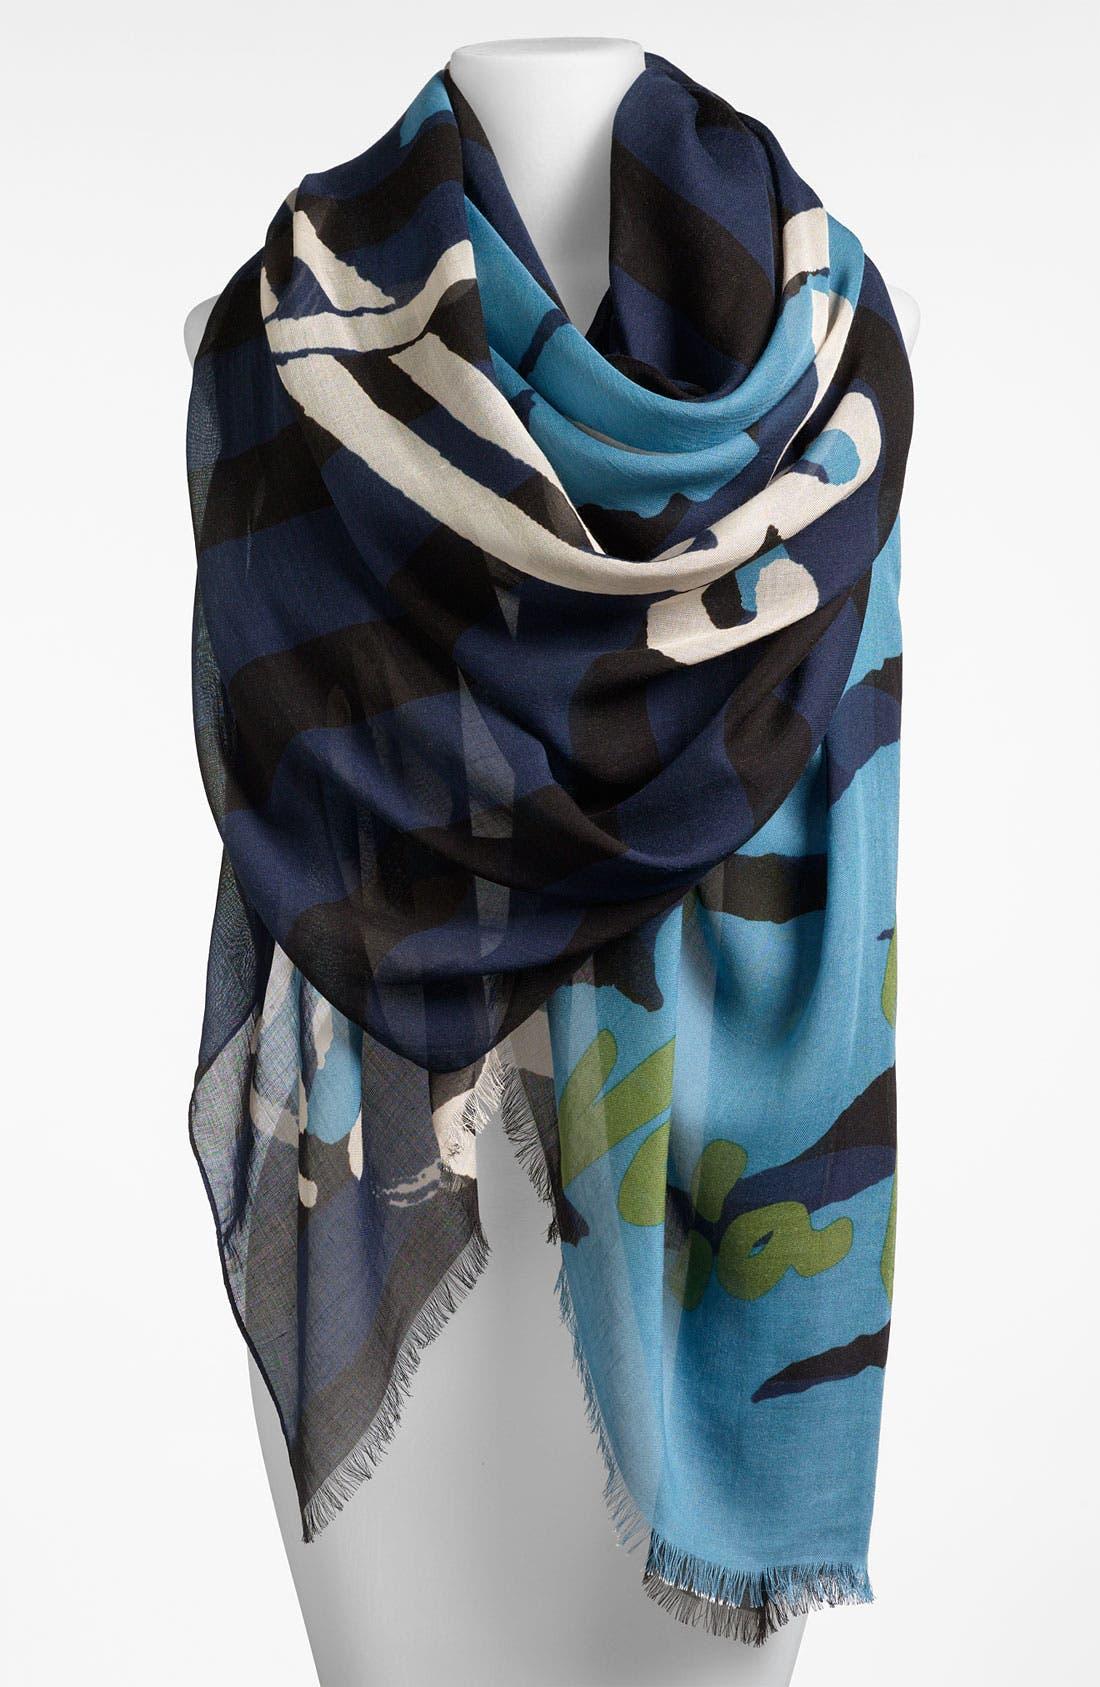 Alternate Image 1 Selected - Sonia Rykiel 'La Joie' Print Stole